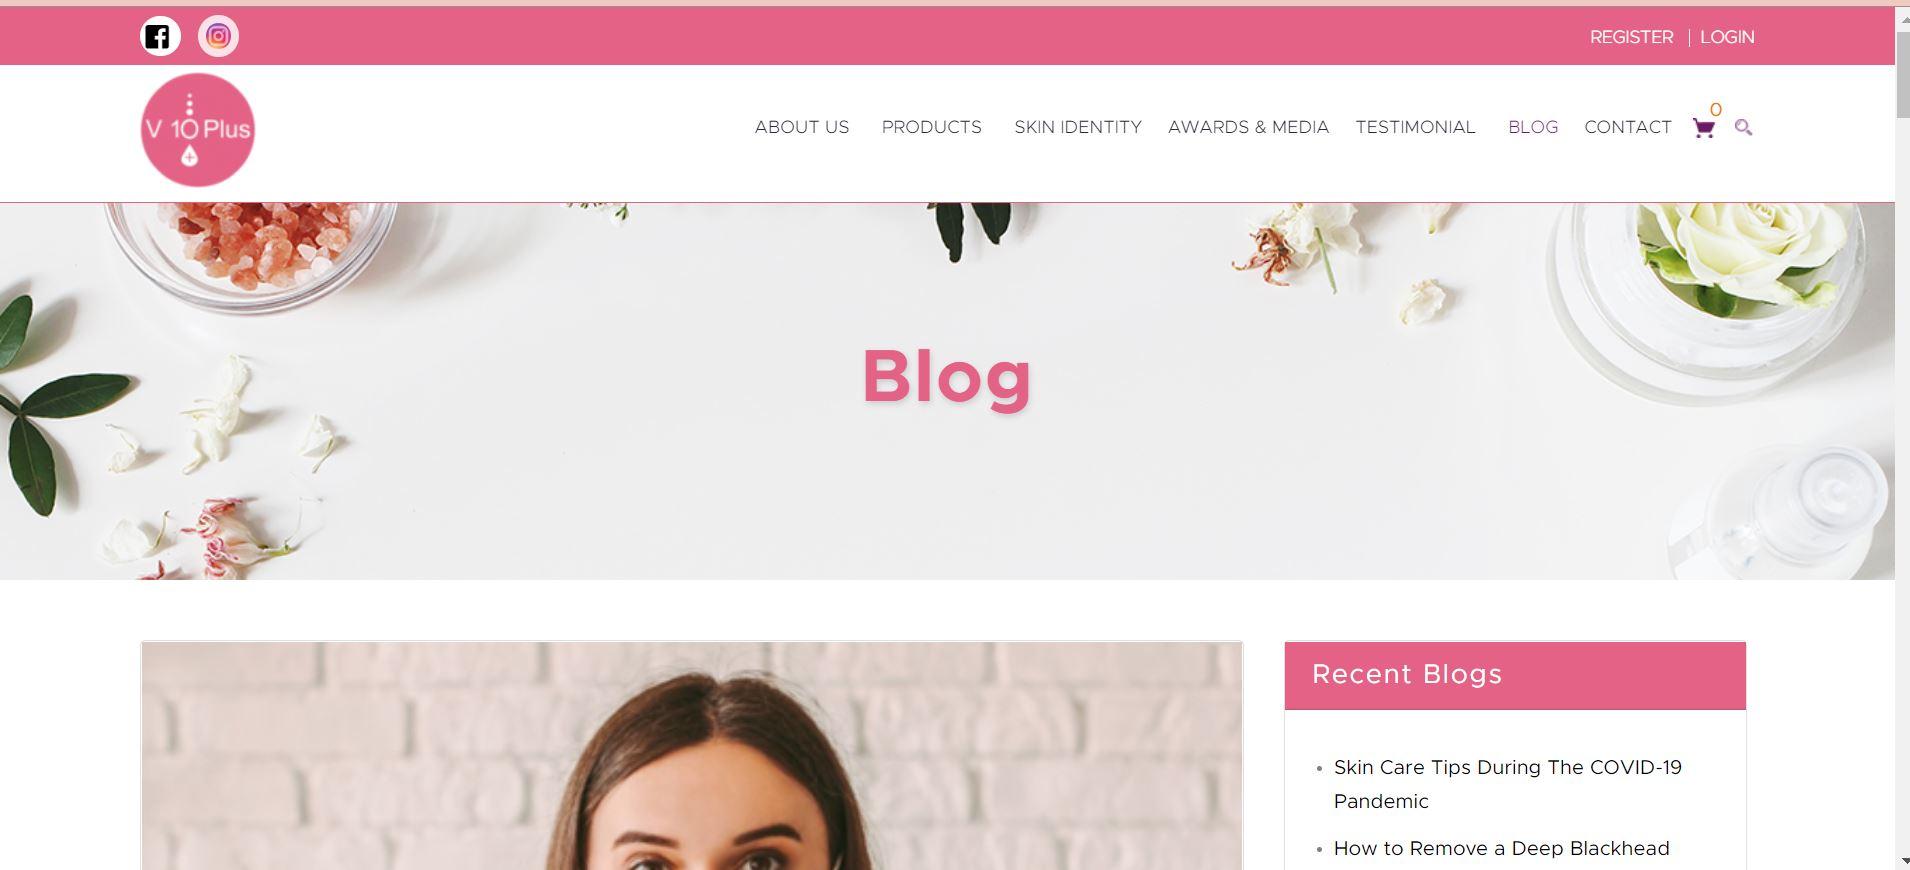 V10Plus Blog